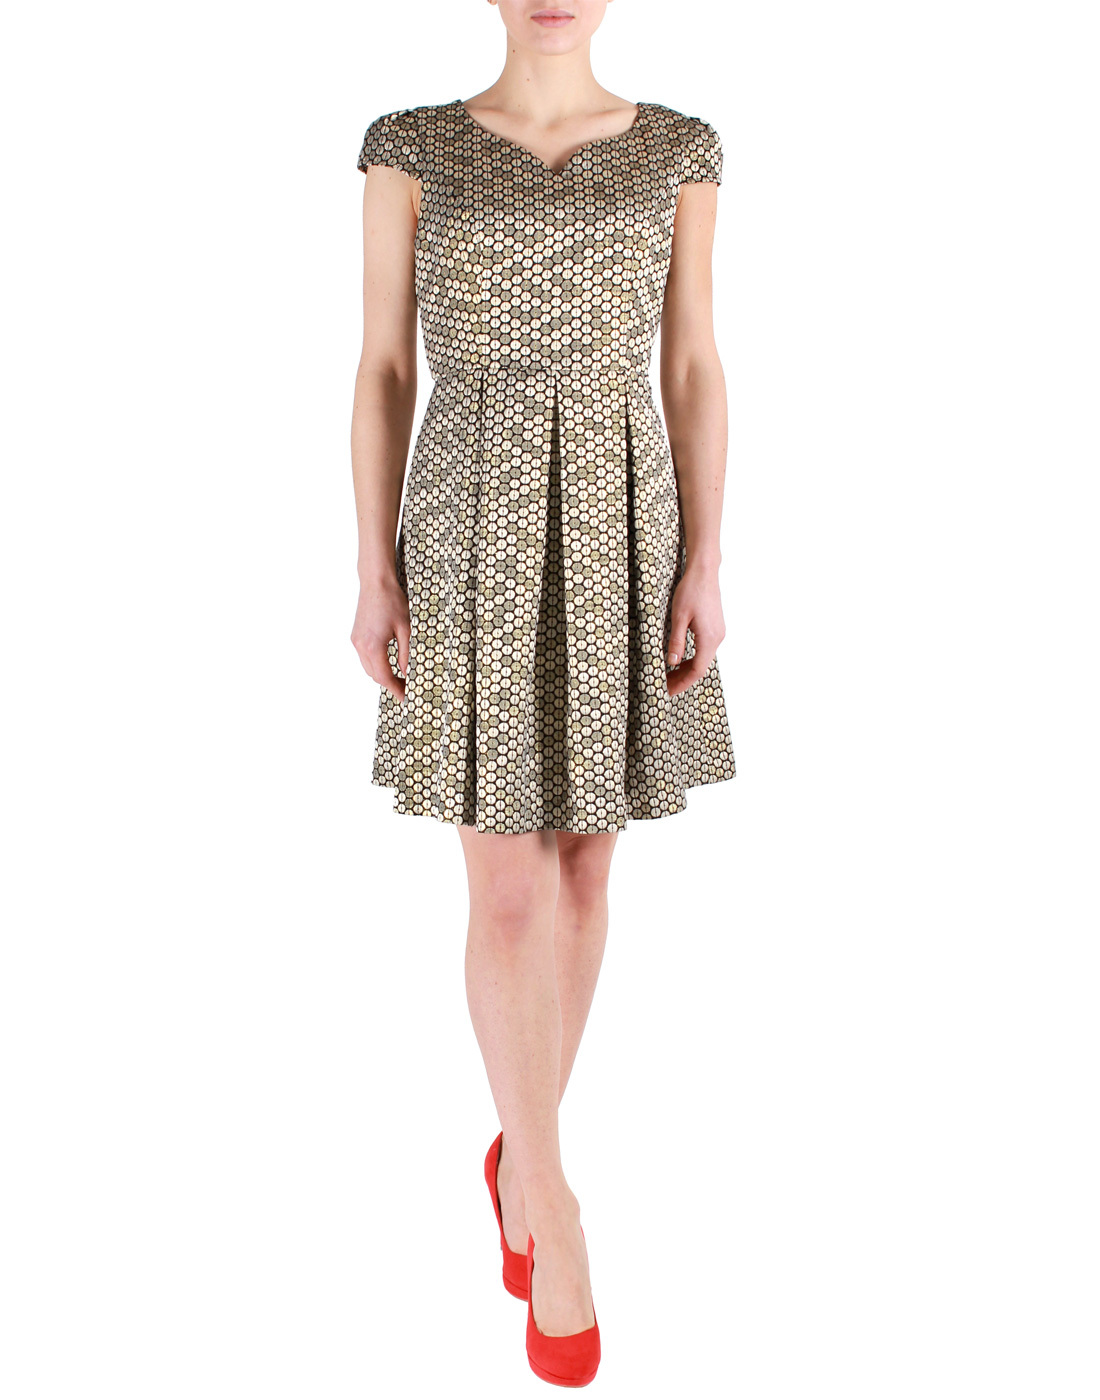 Cora FEVER Retro Sixties Mod Metallic Prom Dress